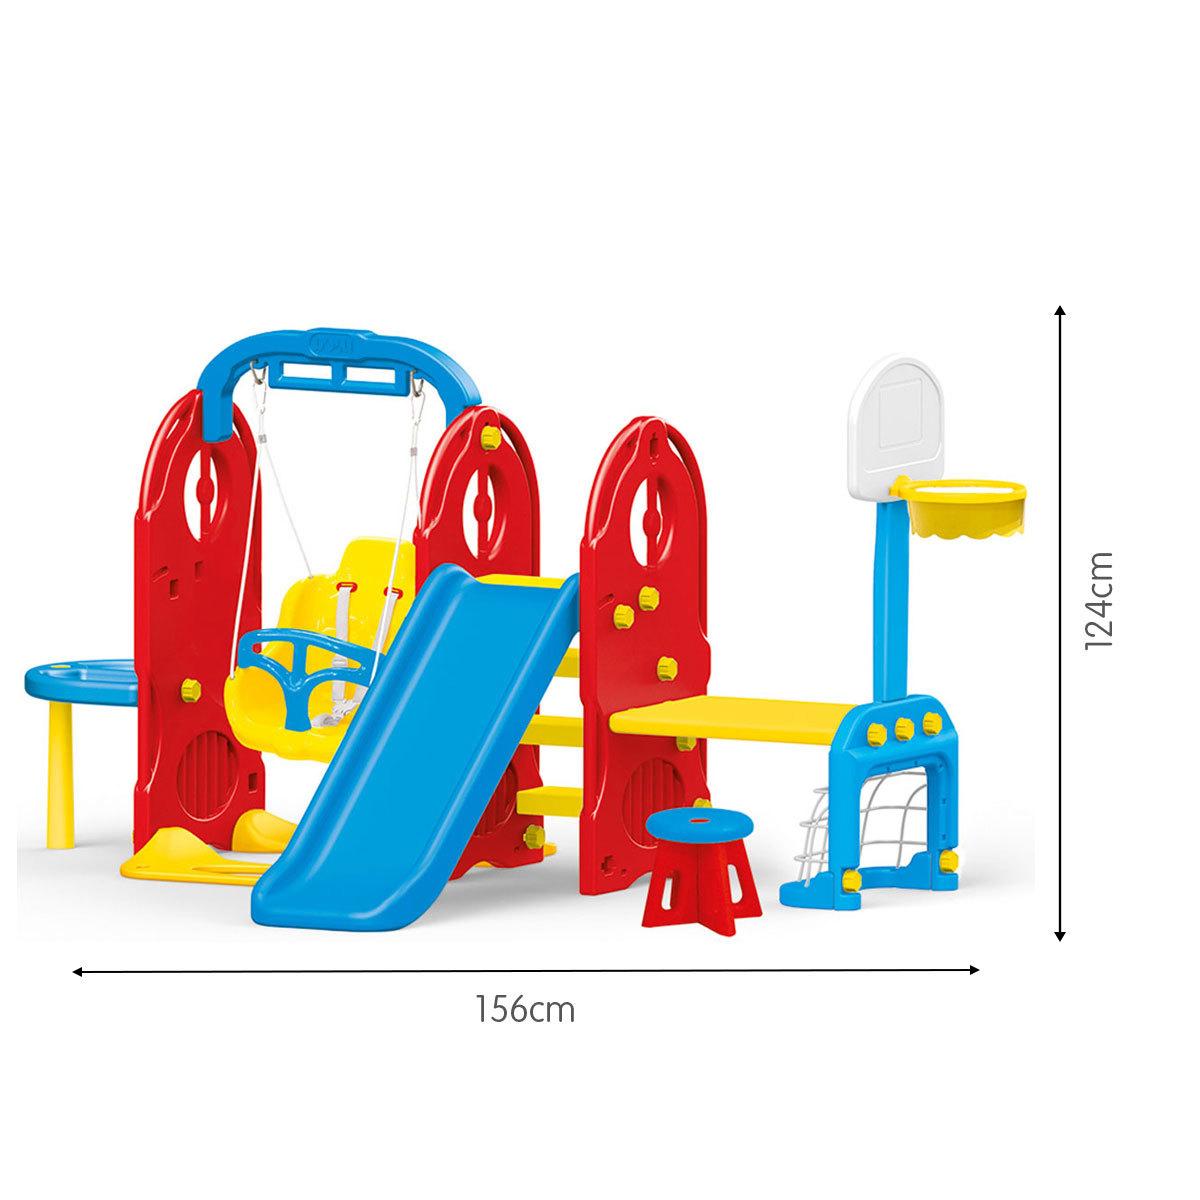 Dolu 7-in-1 Playground Frame